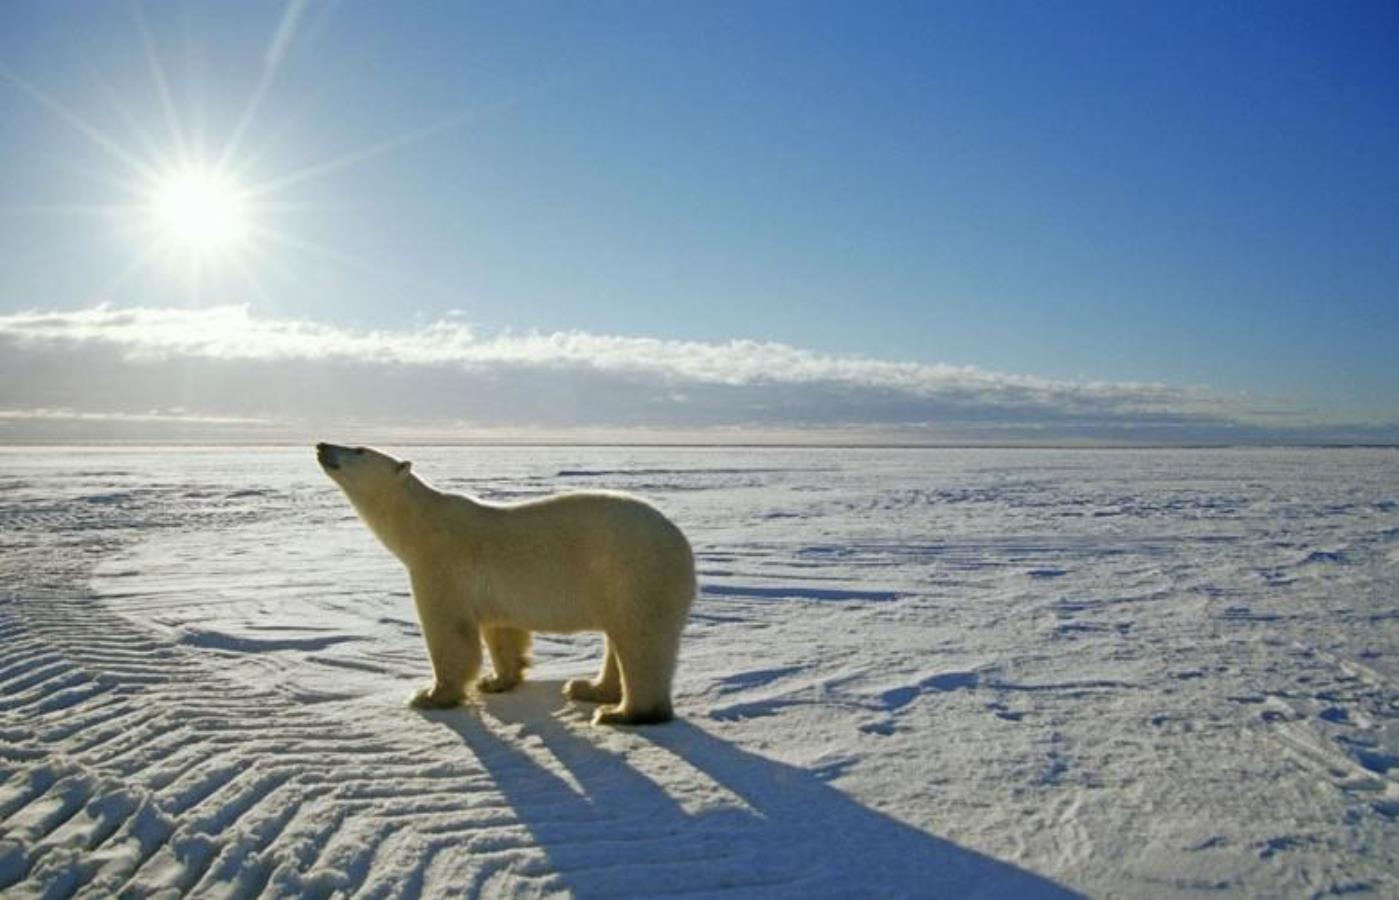 аксессуар крайний север россии фото поросят